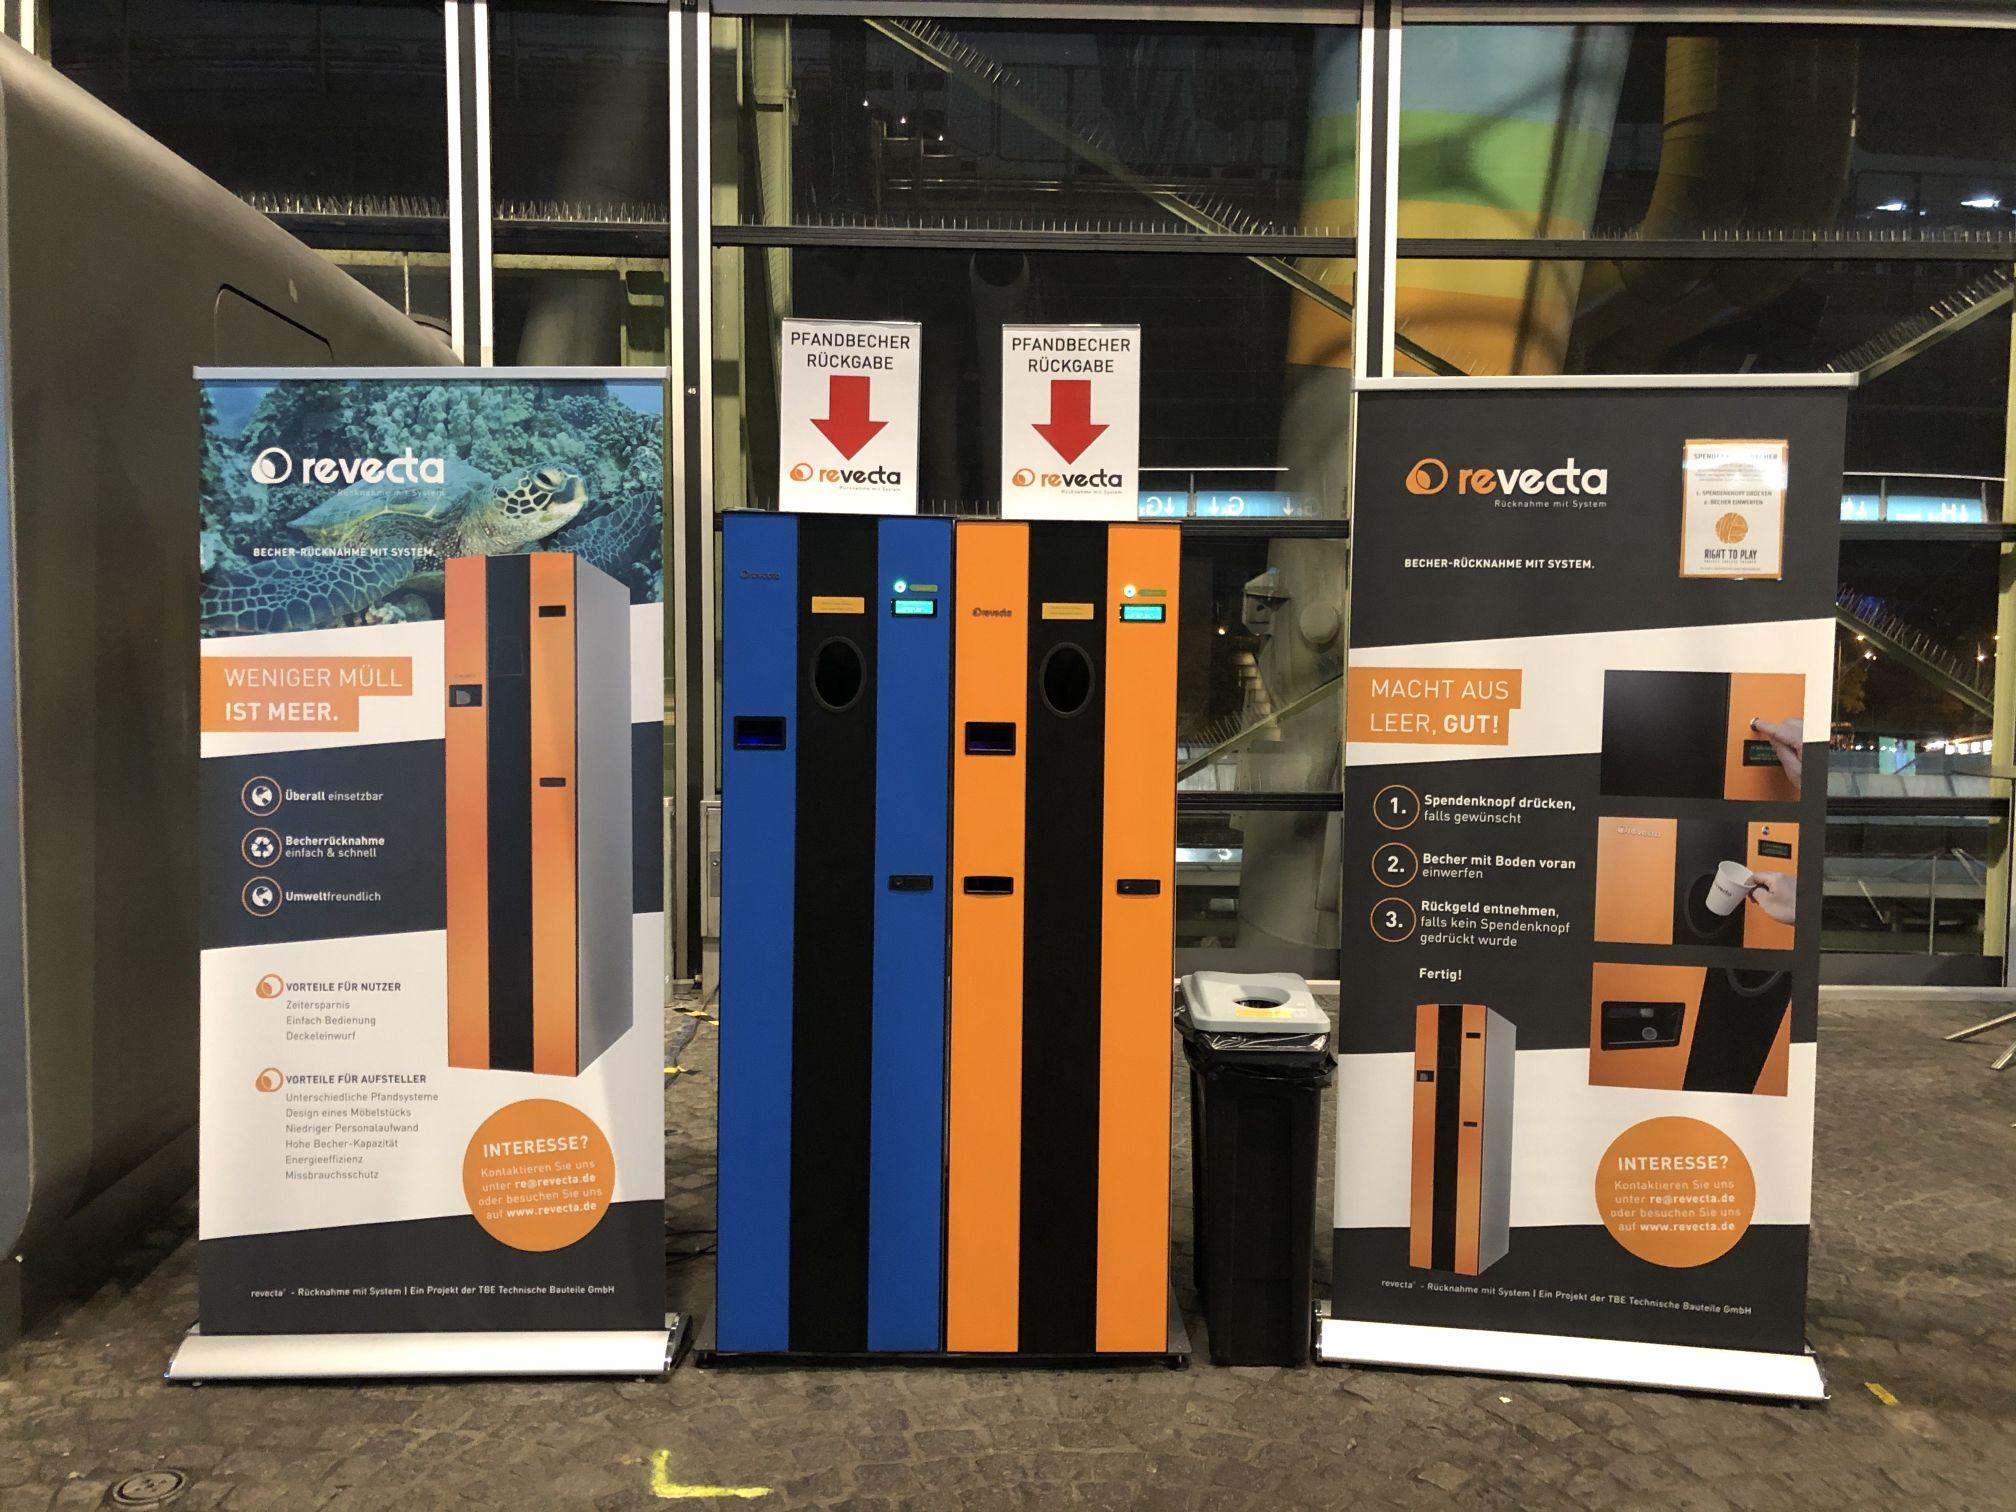 Hersteller Becherrücknahmeautomaten für Konzerte